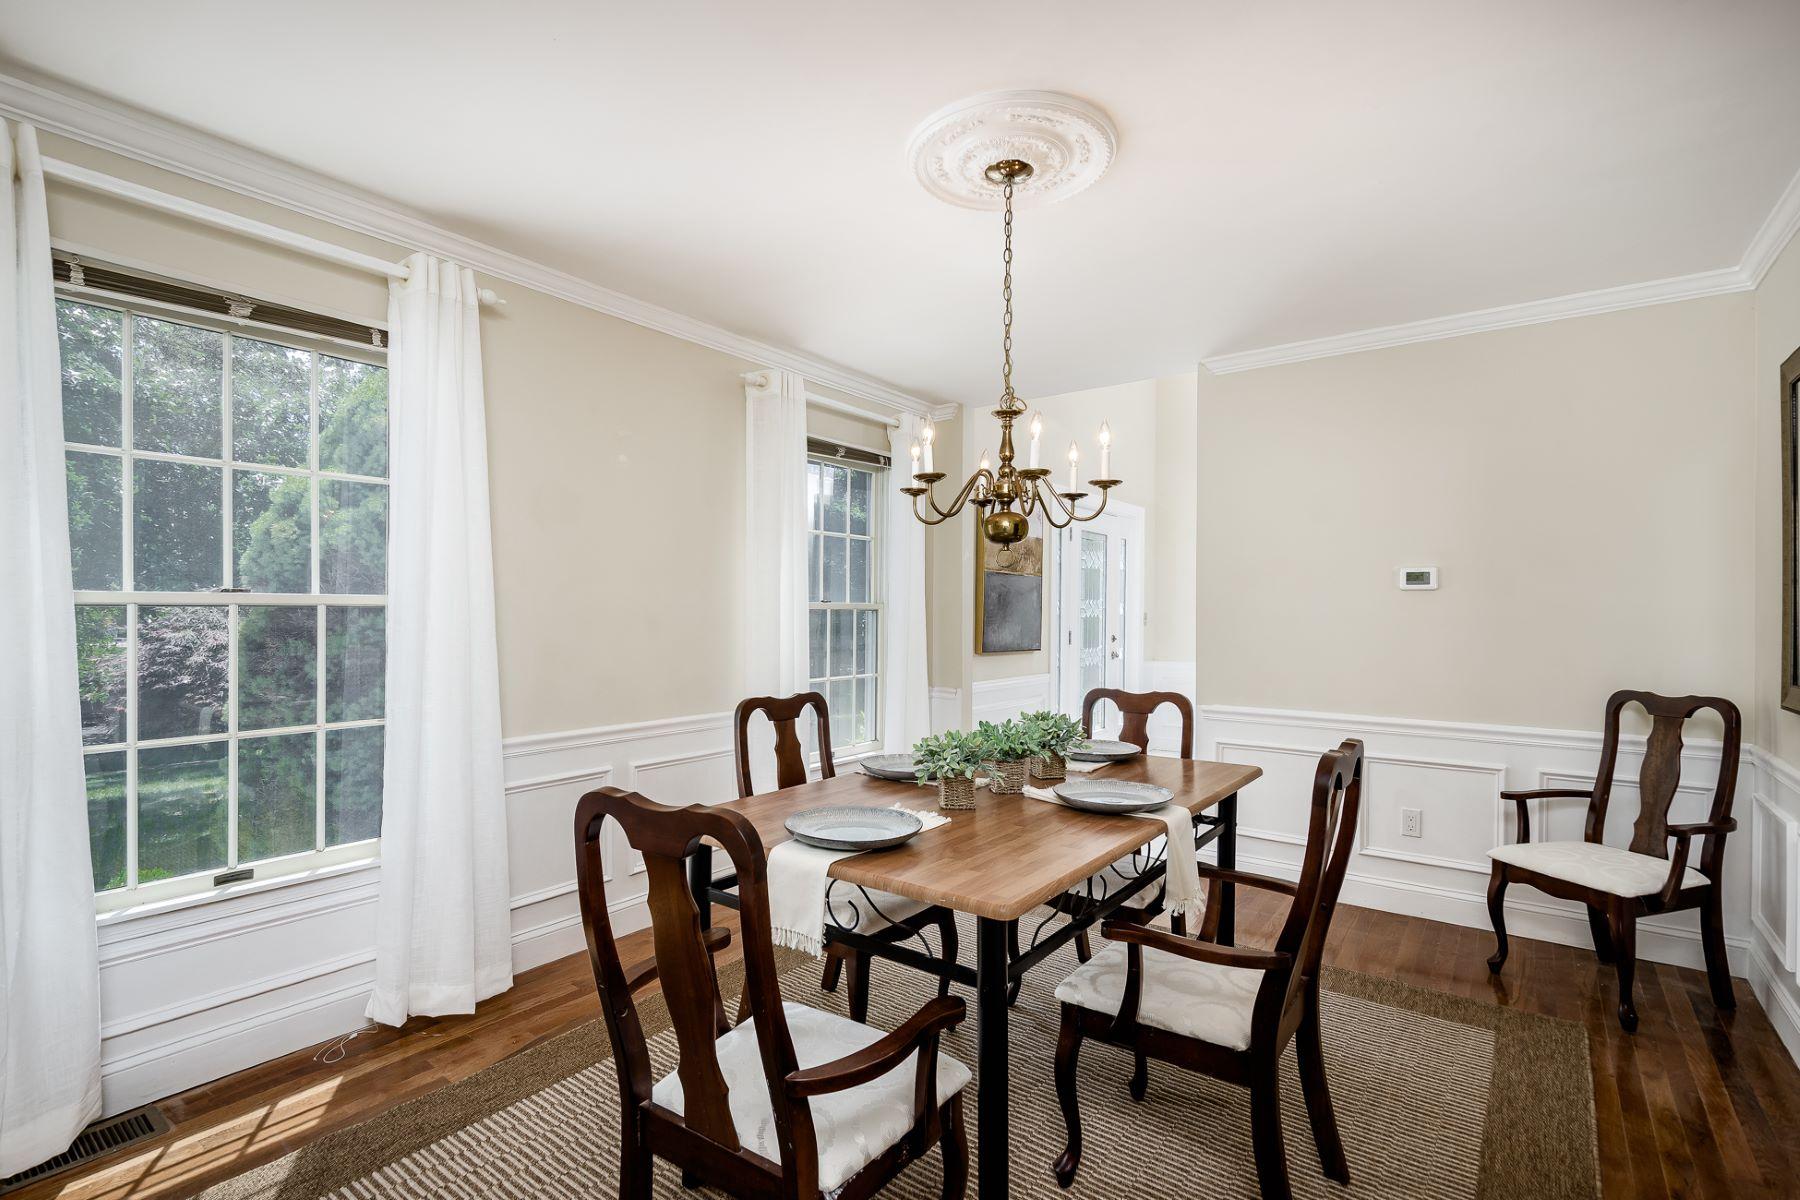 Additional photo for property listing at Elegant, Light-Filled Versatility in Heatherfield 32 Ginnie Lane, West Windsor, Νιου Τζερσεϋ 08550 Ηνωμένες Πολιτείες